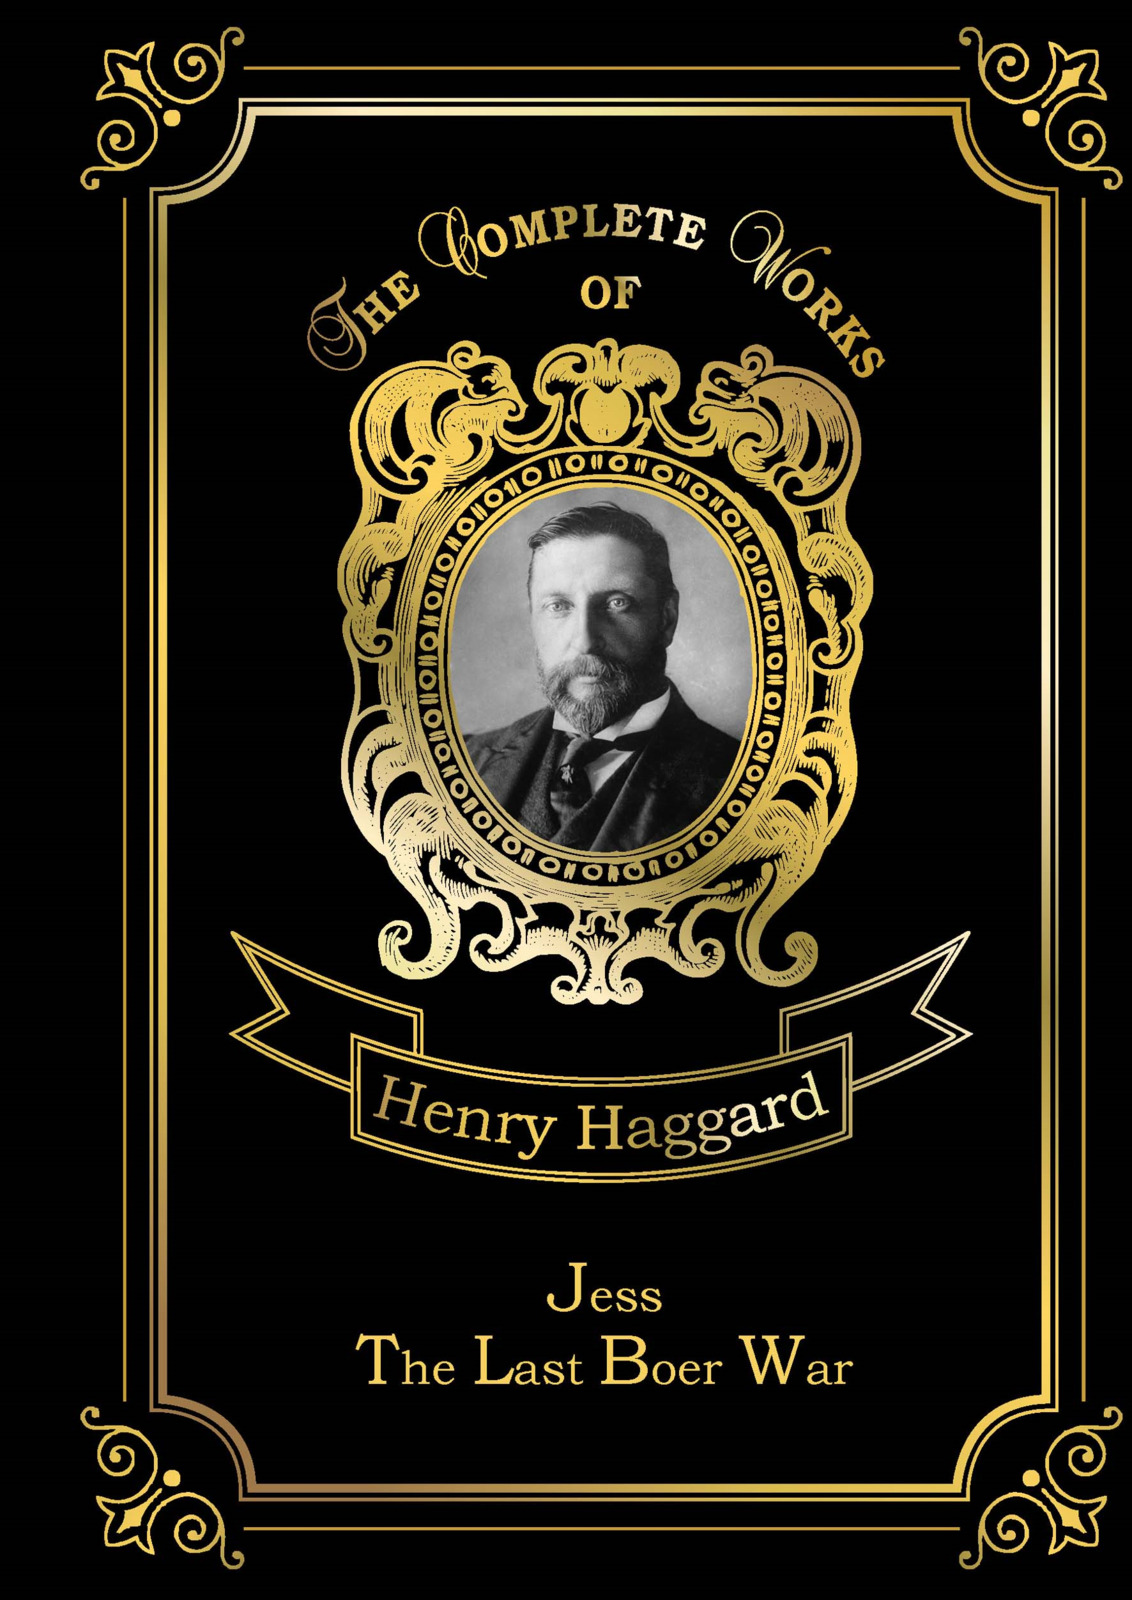 H. R. Haggard Jess & The Last Boer War